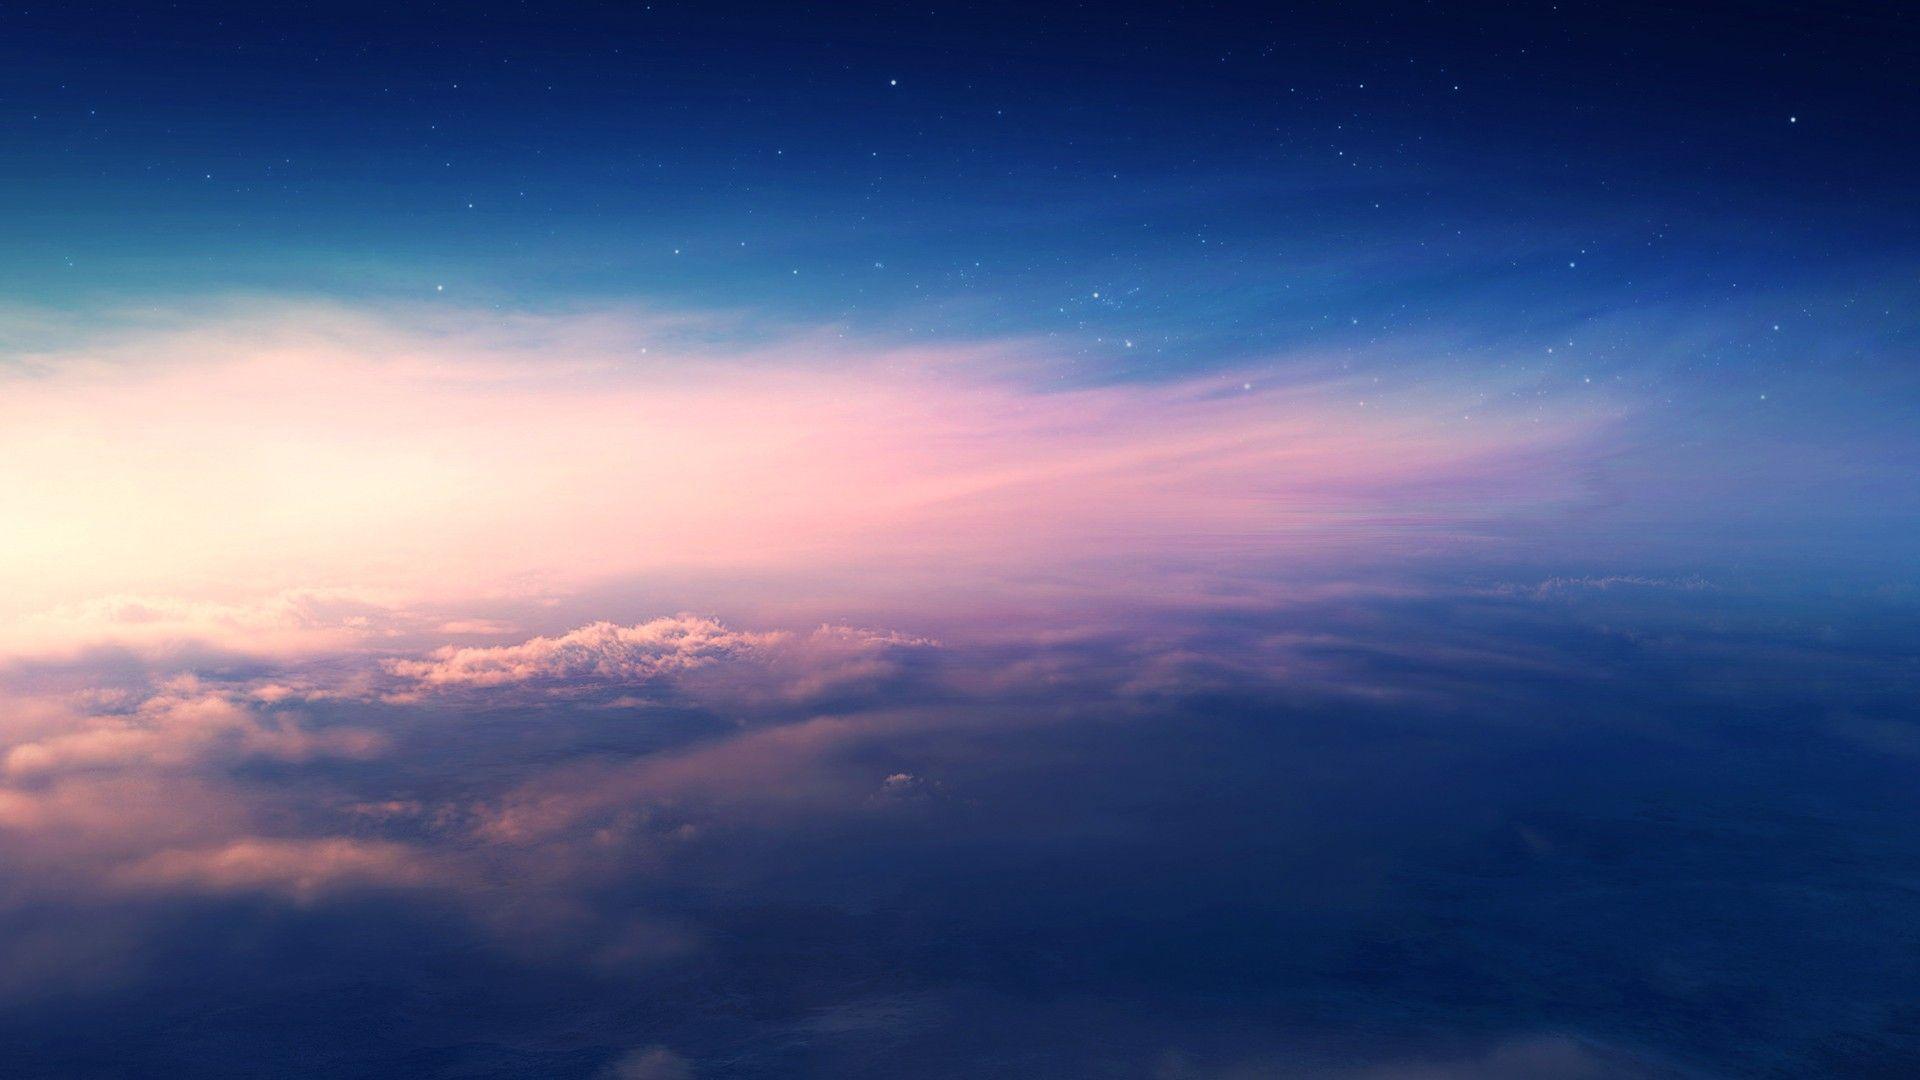 Evening-Sky-http-www-fullhdwpp-com-space-evening-sky-wallpaper-wp3605409